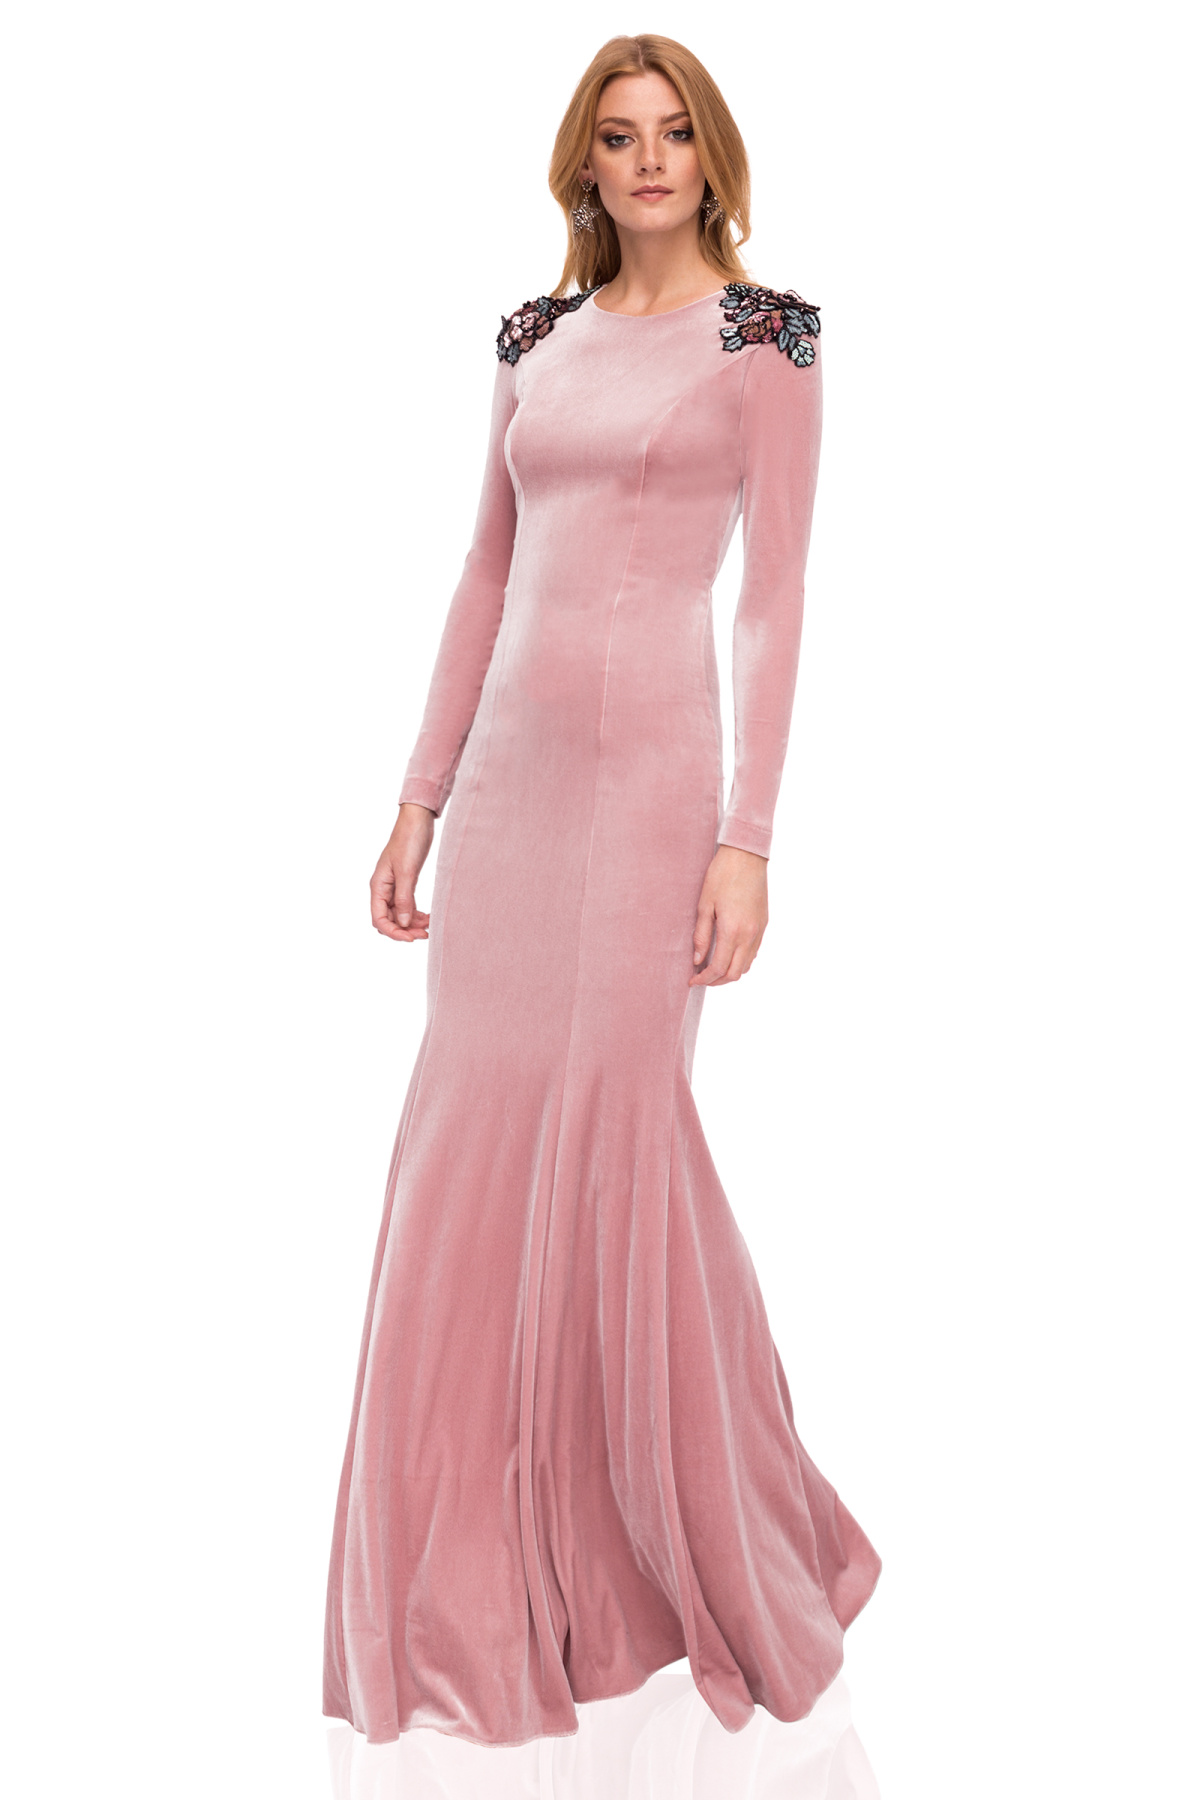 06a3ad0e824959 Elegancka aksamitna sukienka maxi   rs10161   NISSA